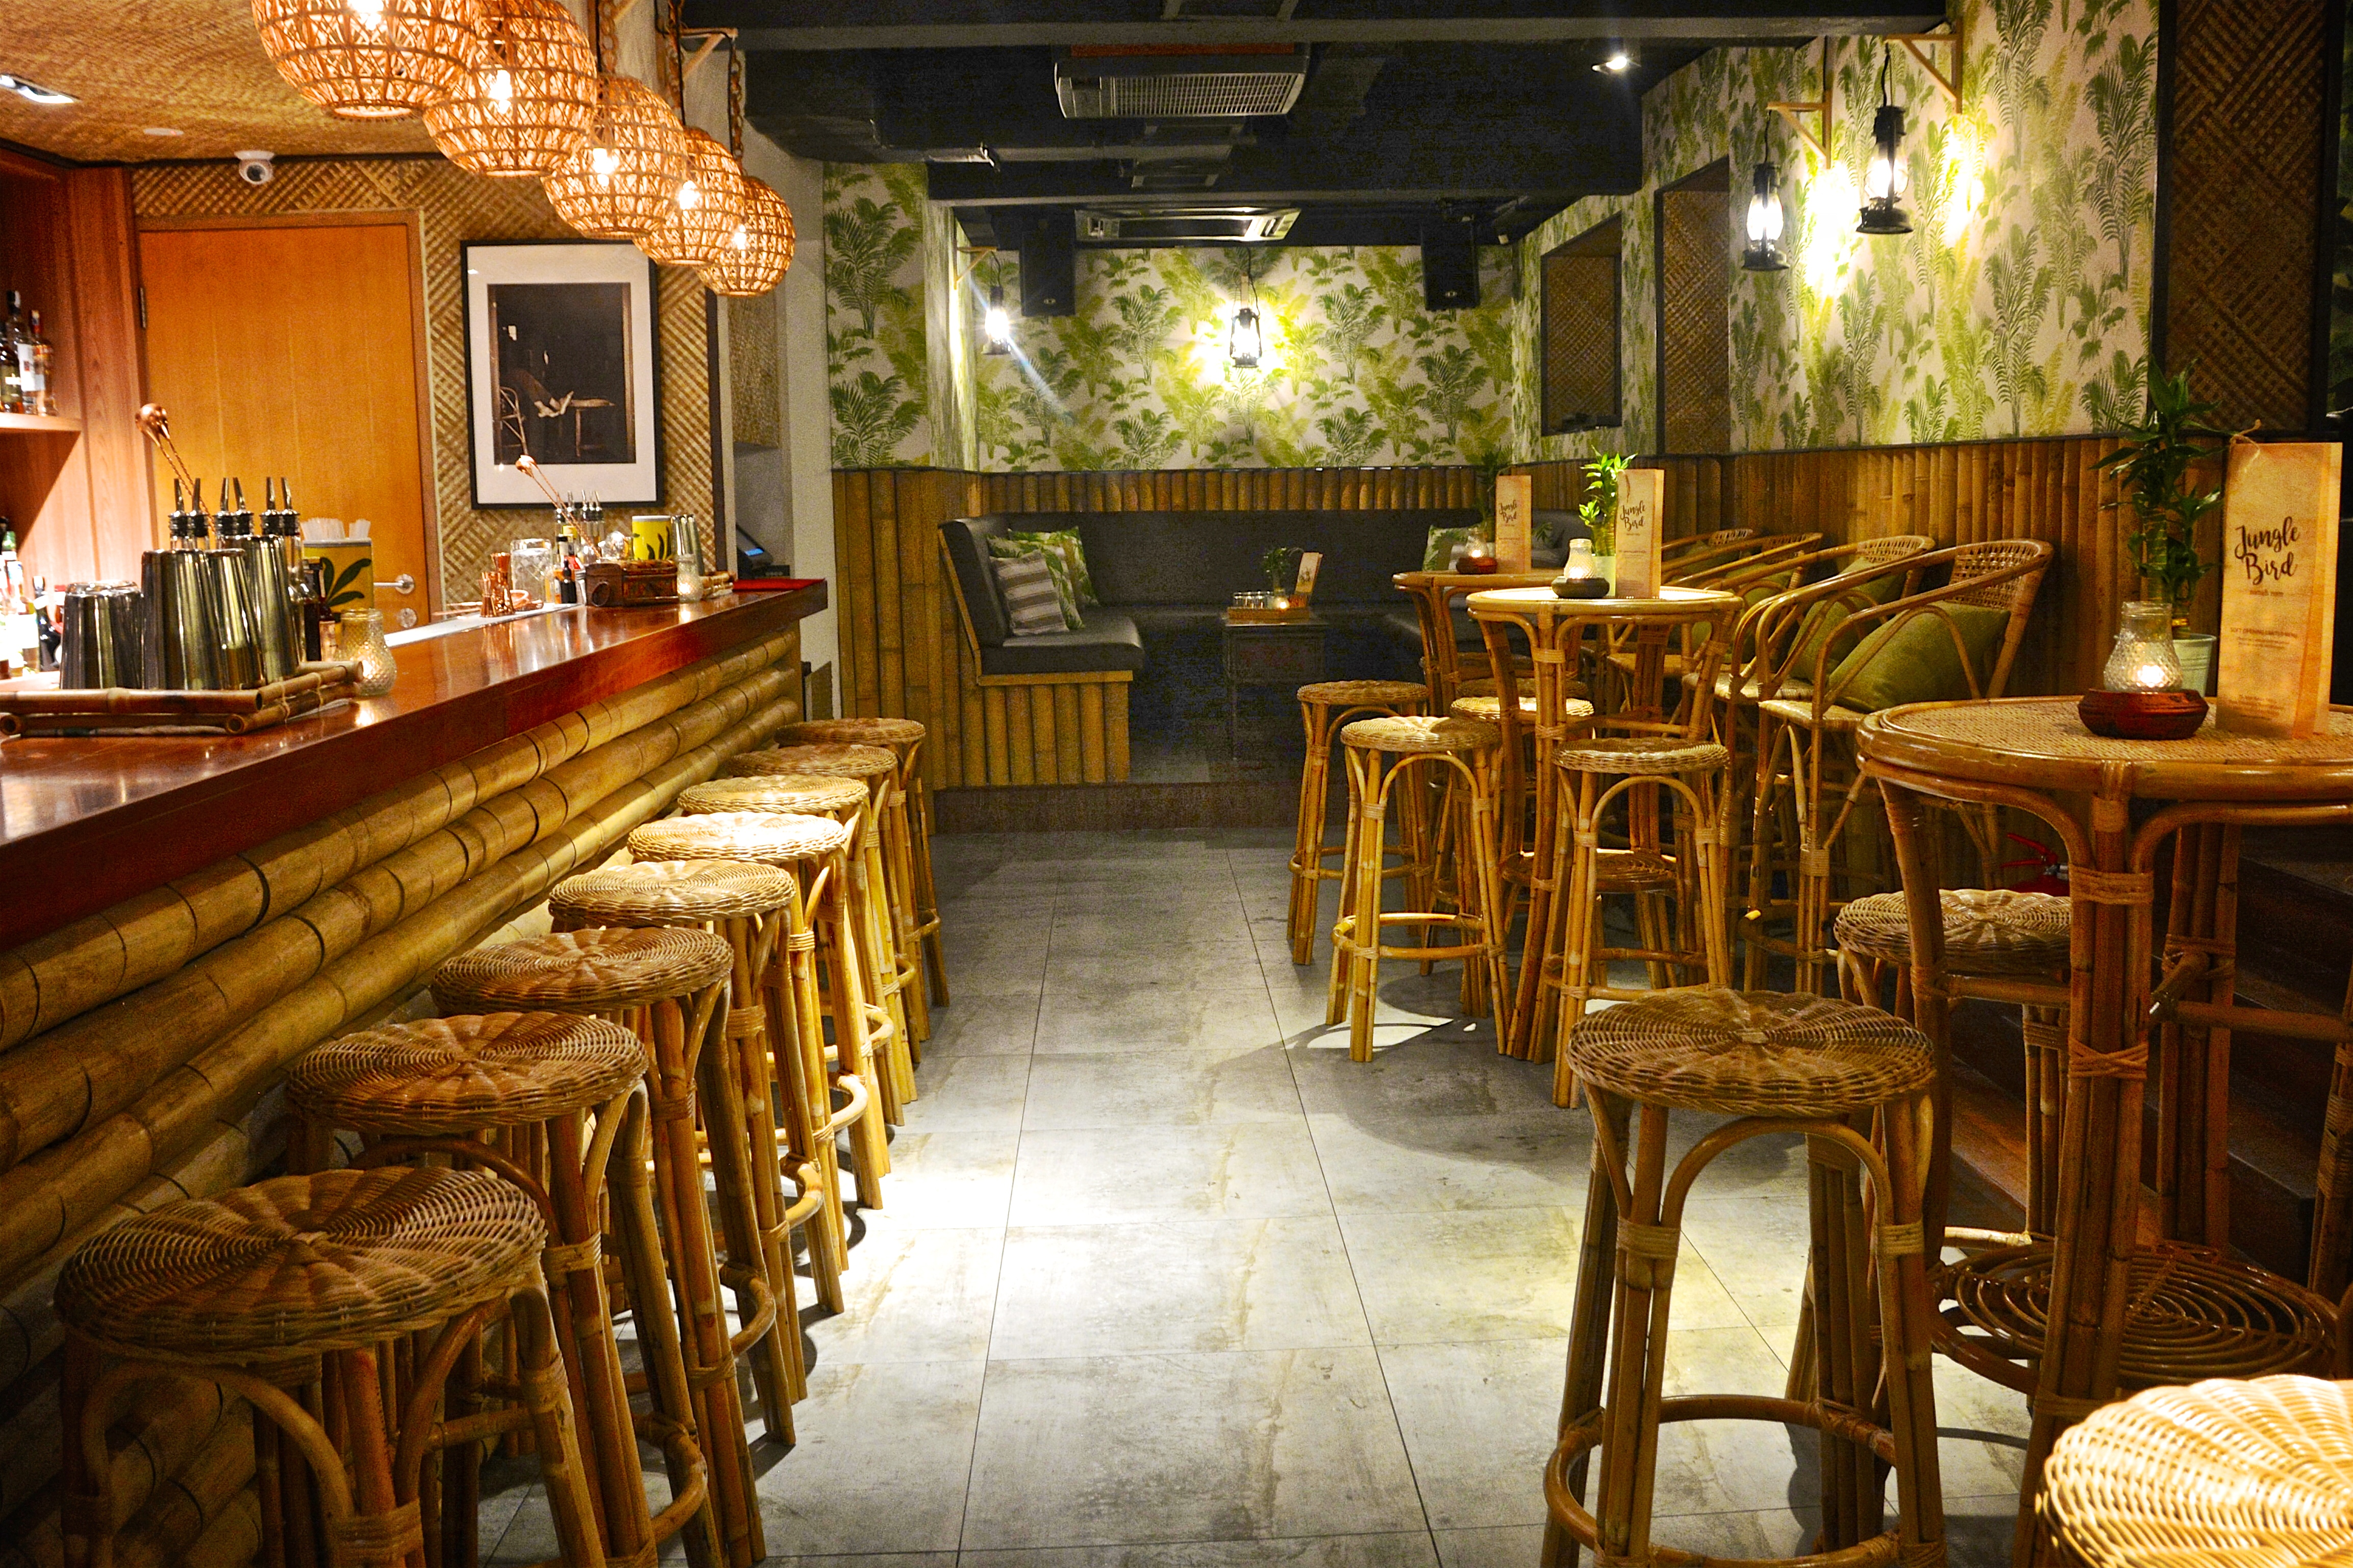 Beautiful interior at the rum-focused JungleBird in Damansara Heights